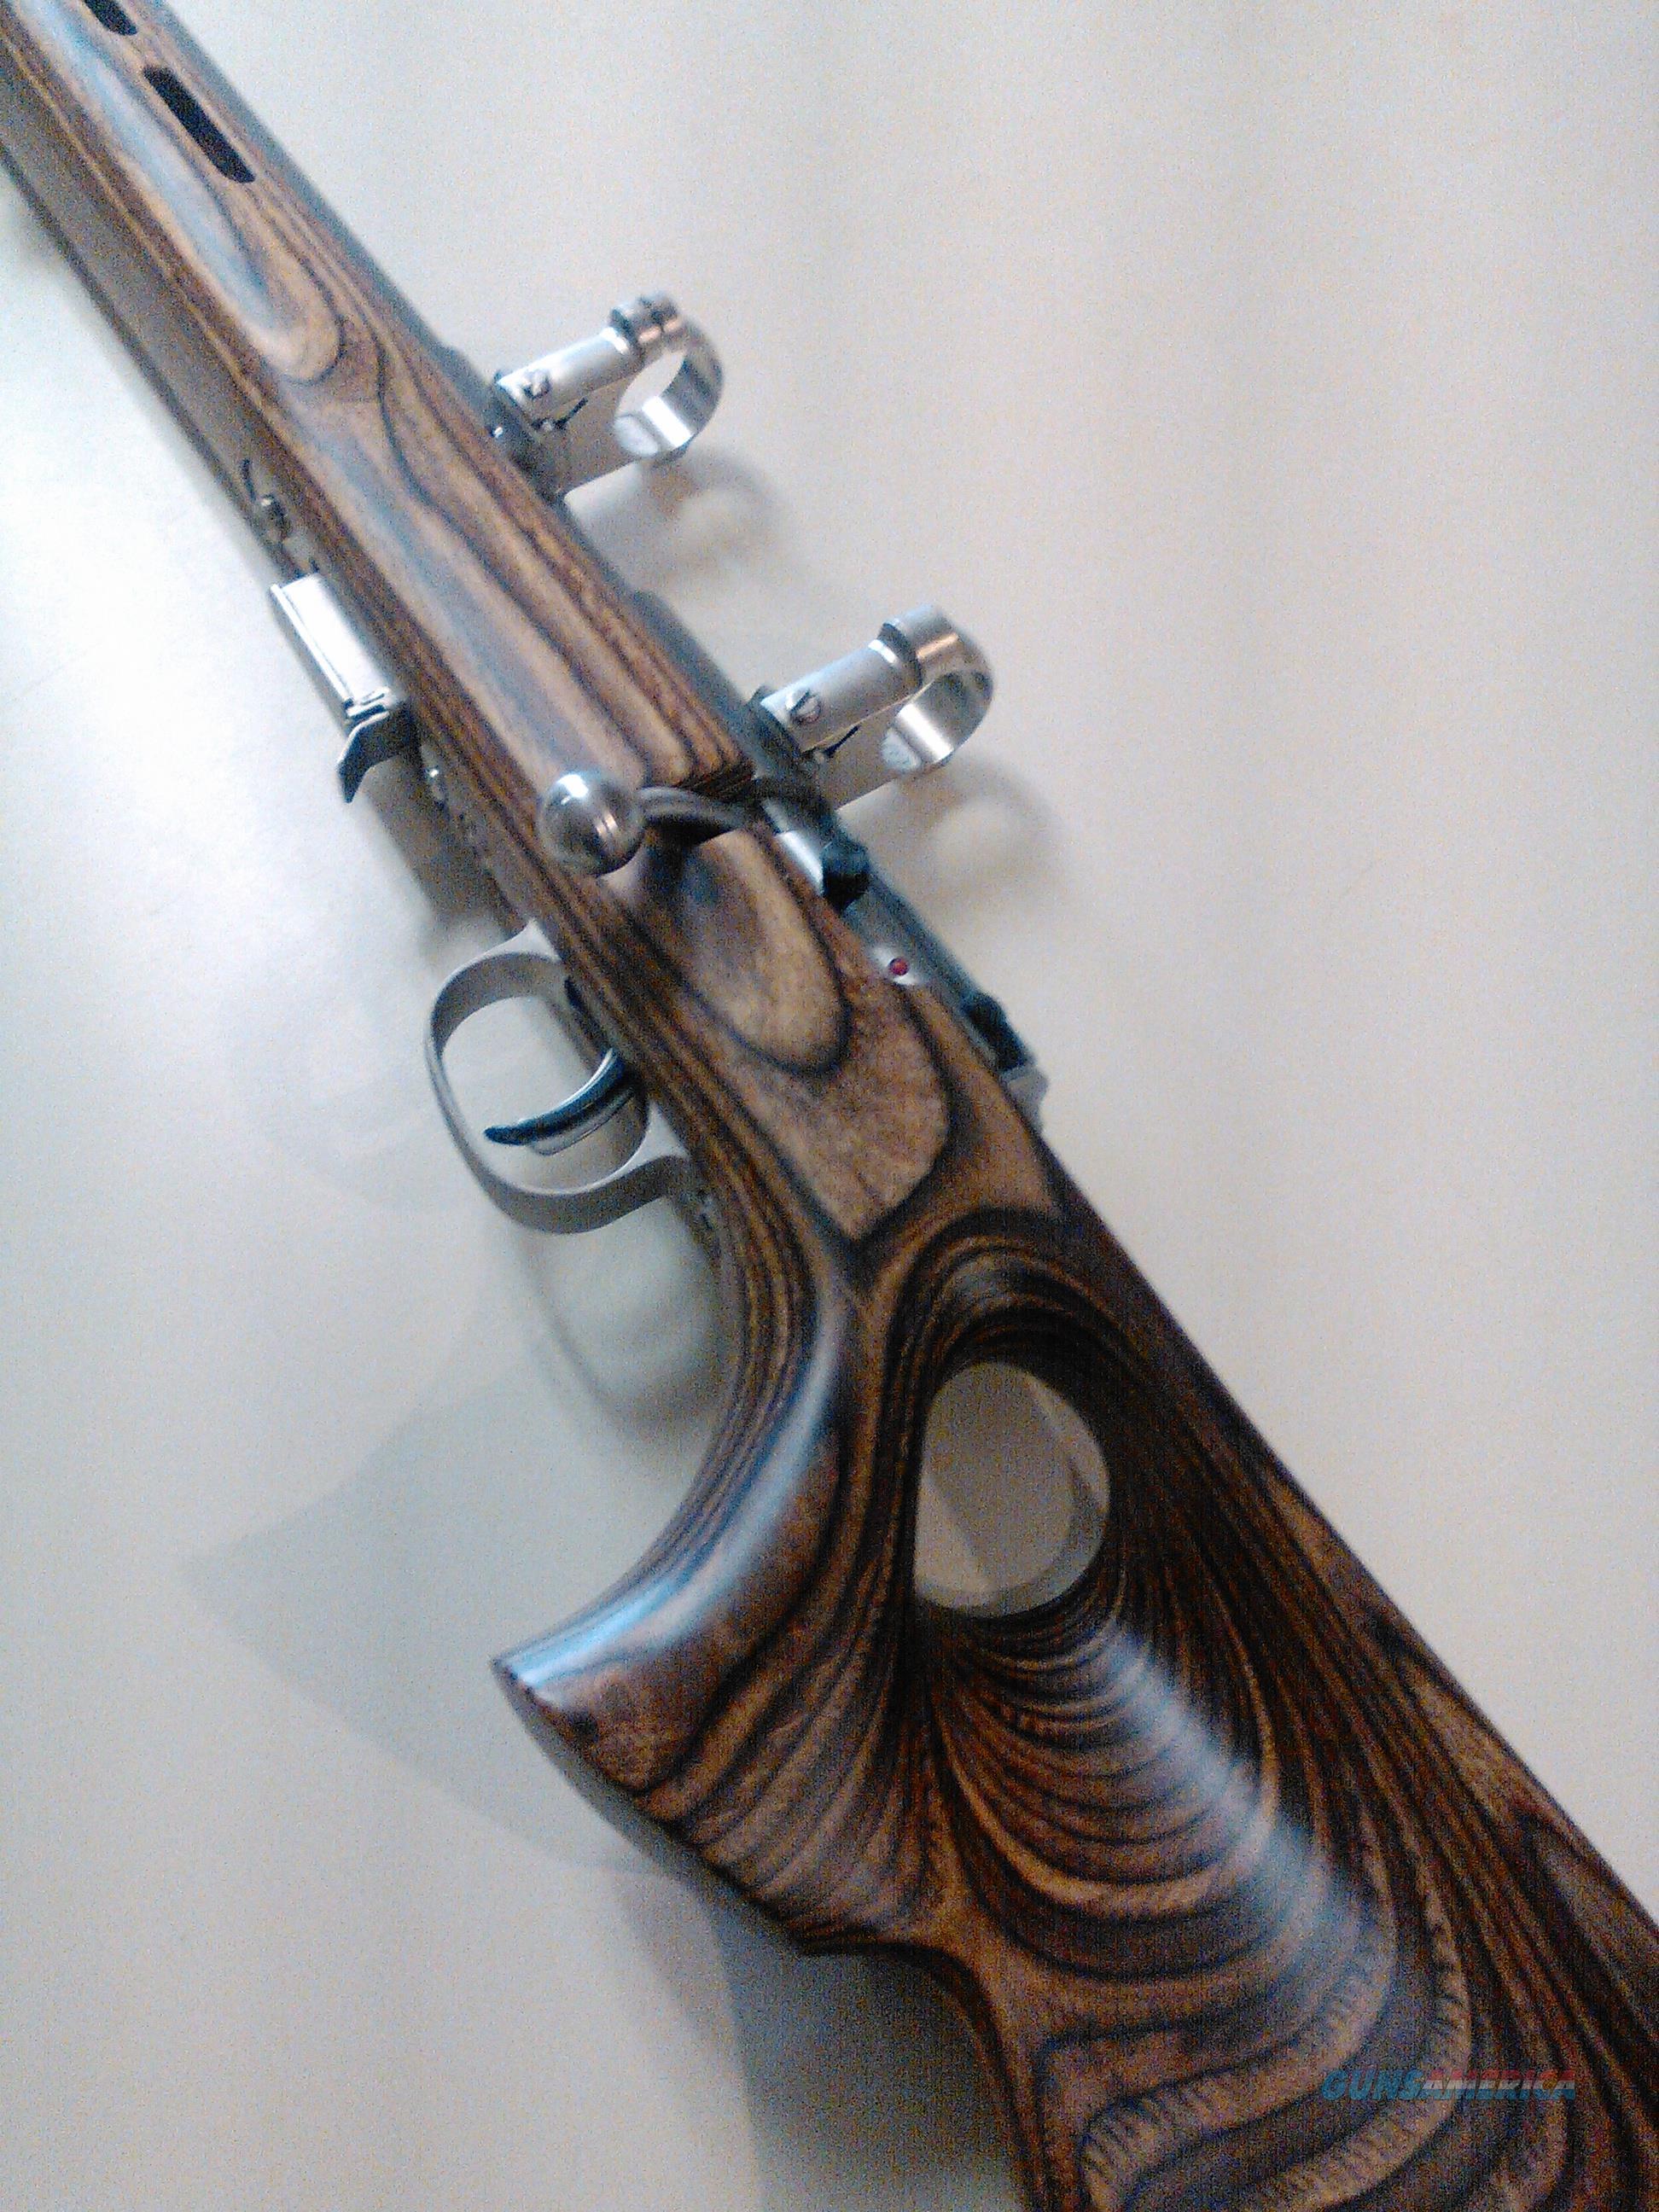 Savage 17 HMR  Guns > Rifles > Savage Rifles > Rimfire